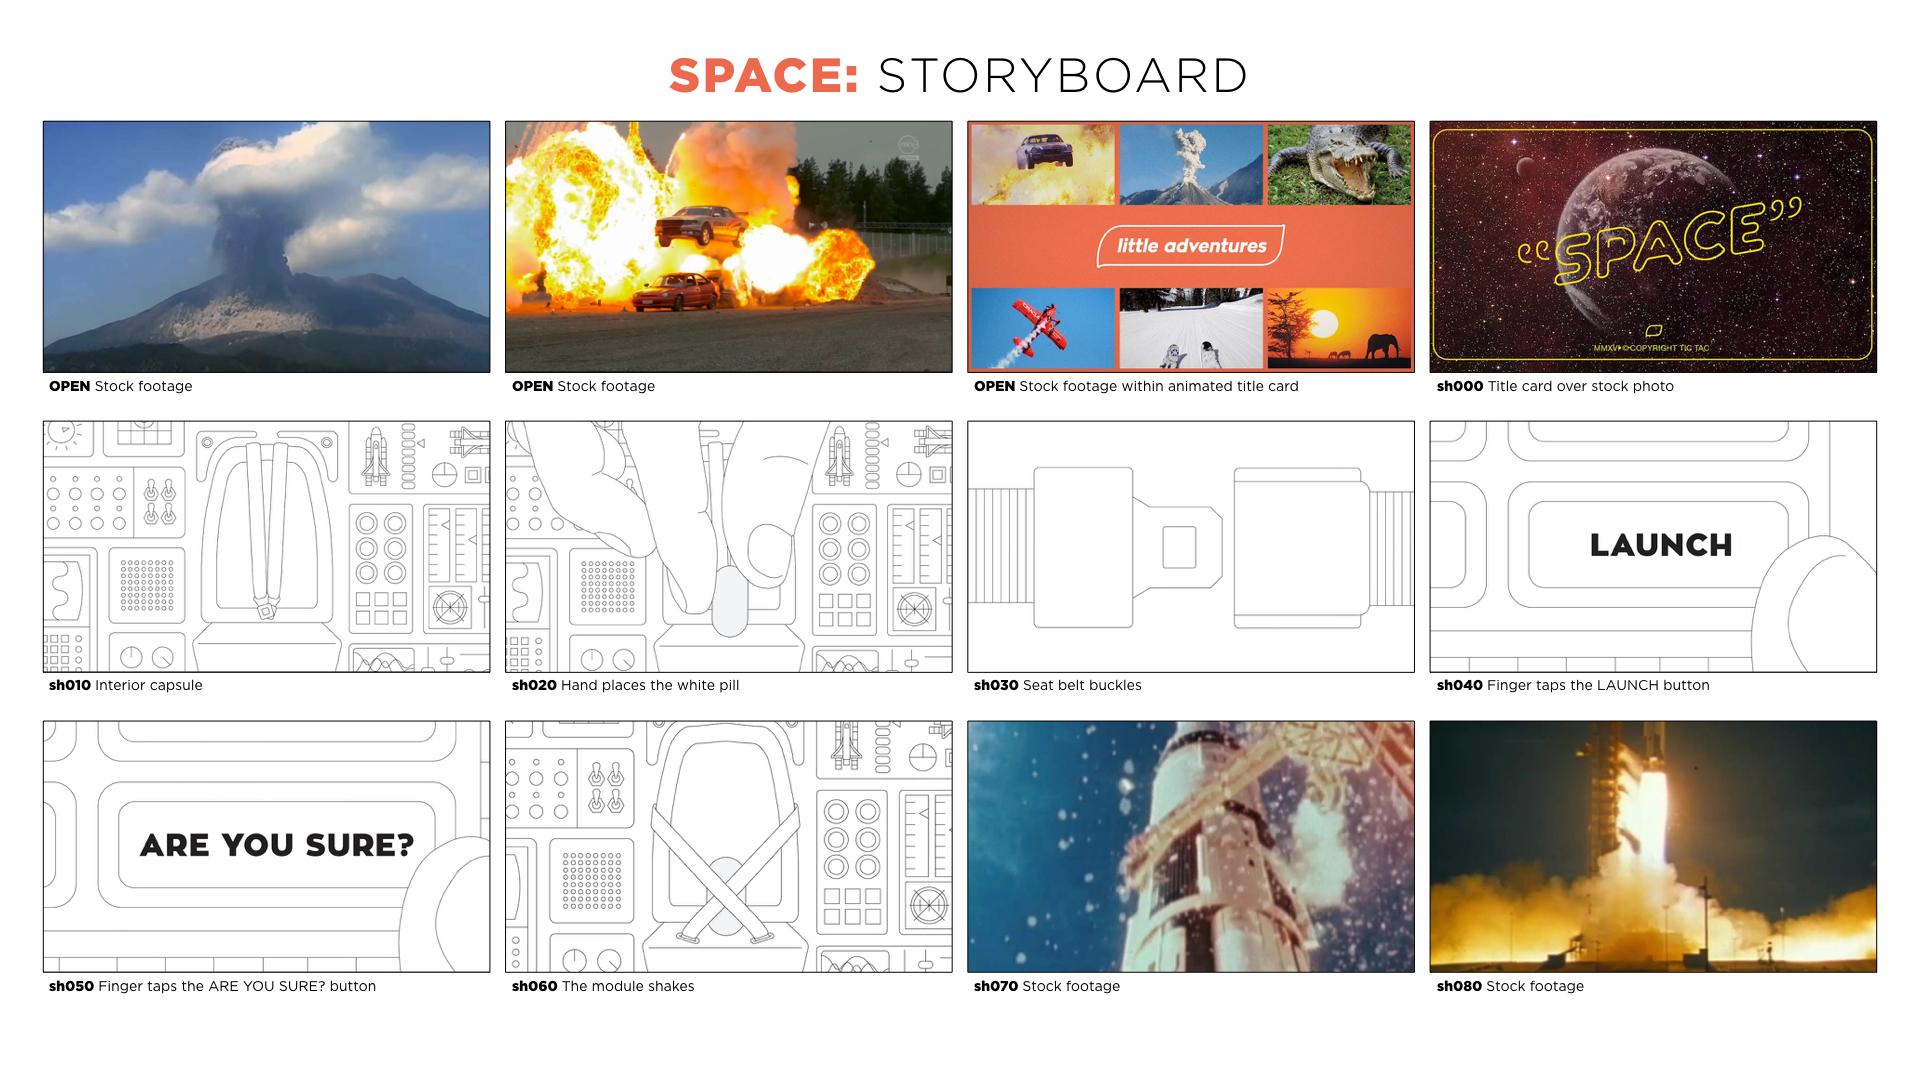 TicTac_LittleAdventures-Storyboardos_01.005.jpeg